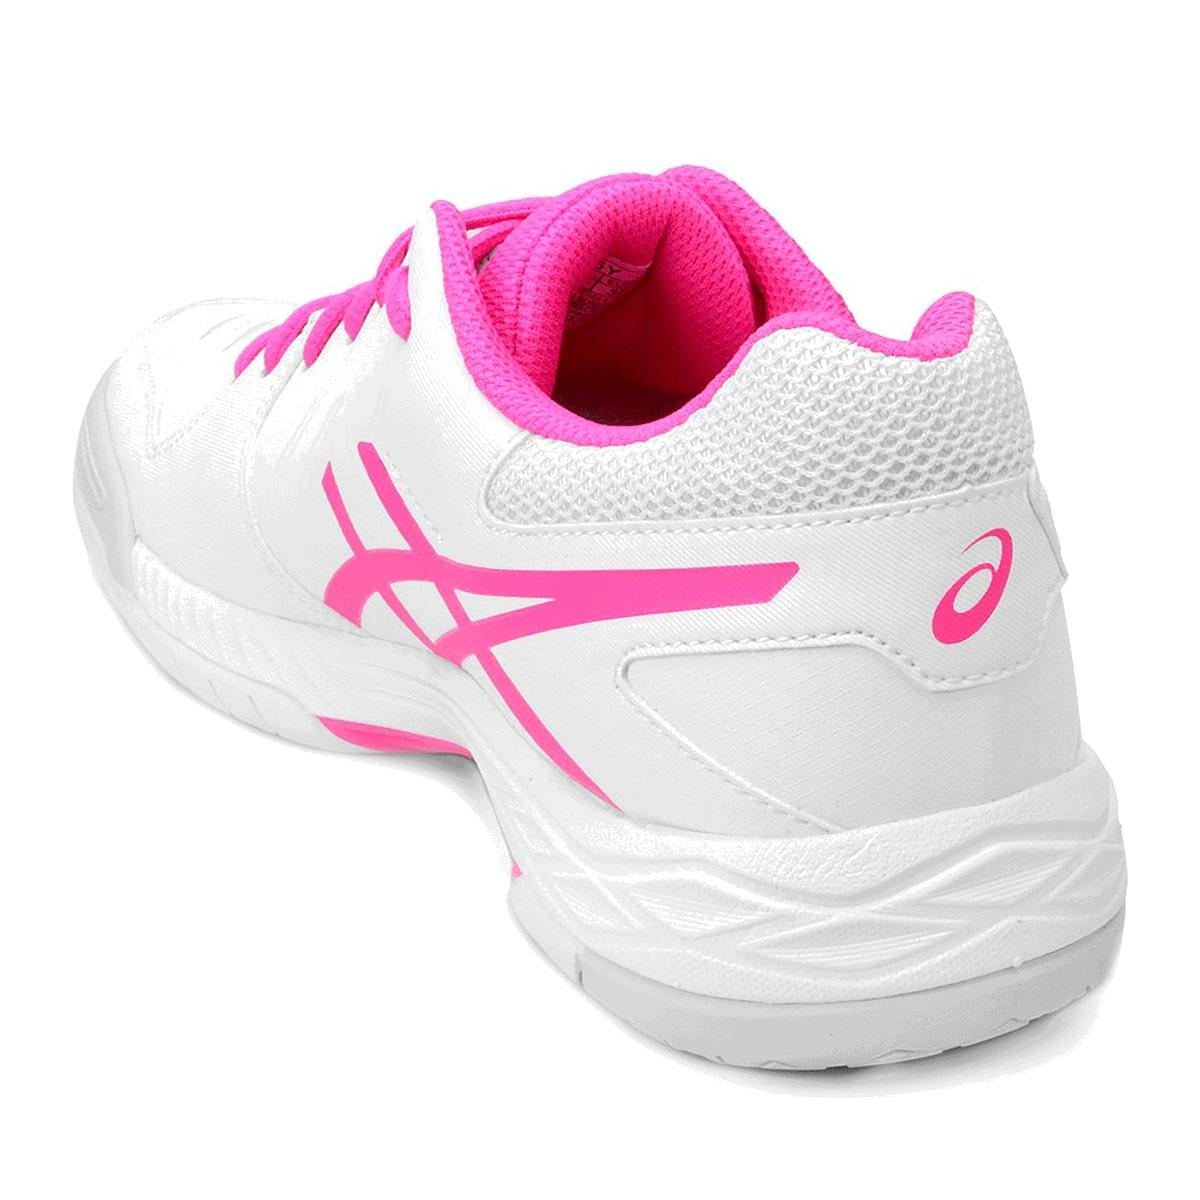 Tênis Asics Gel-Game 6 Feminino Branco Rosa